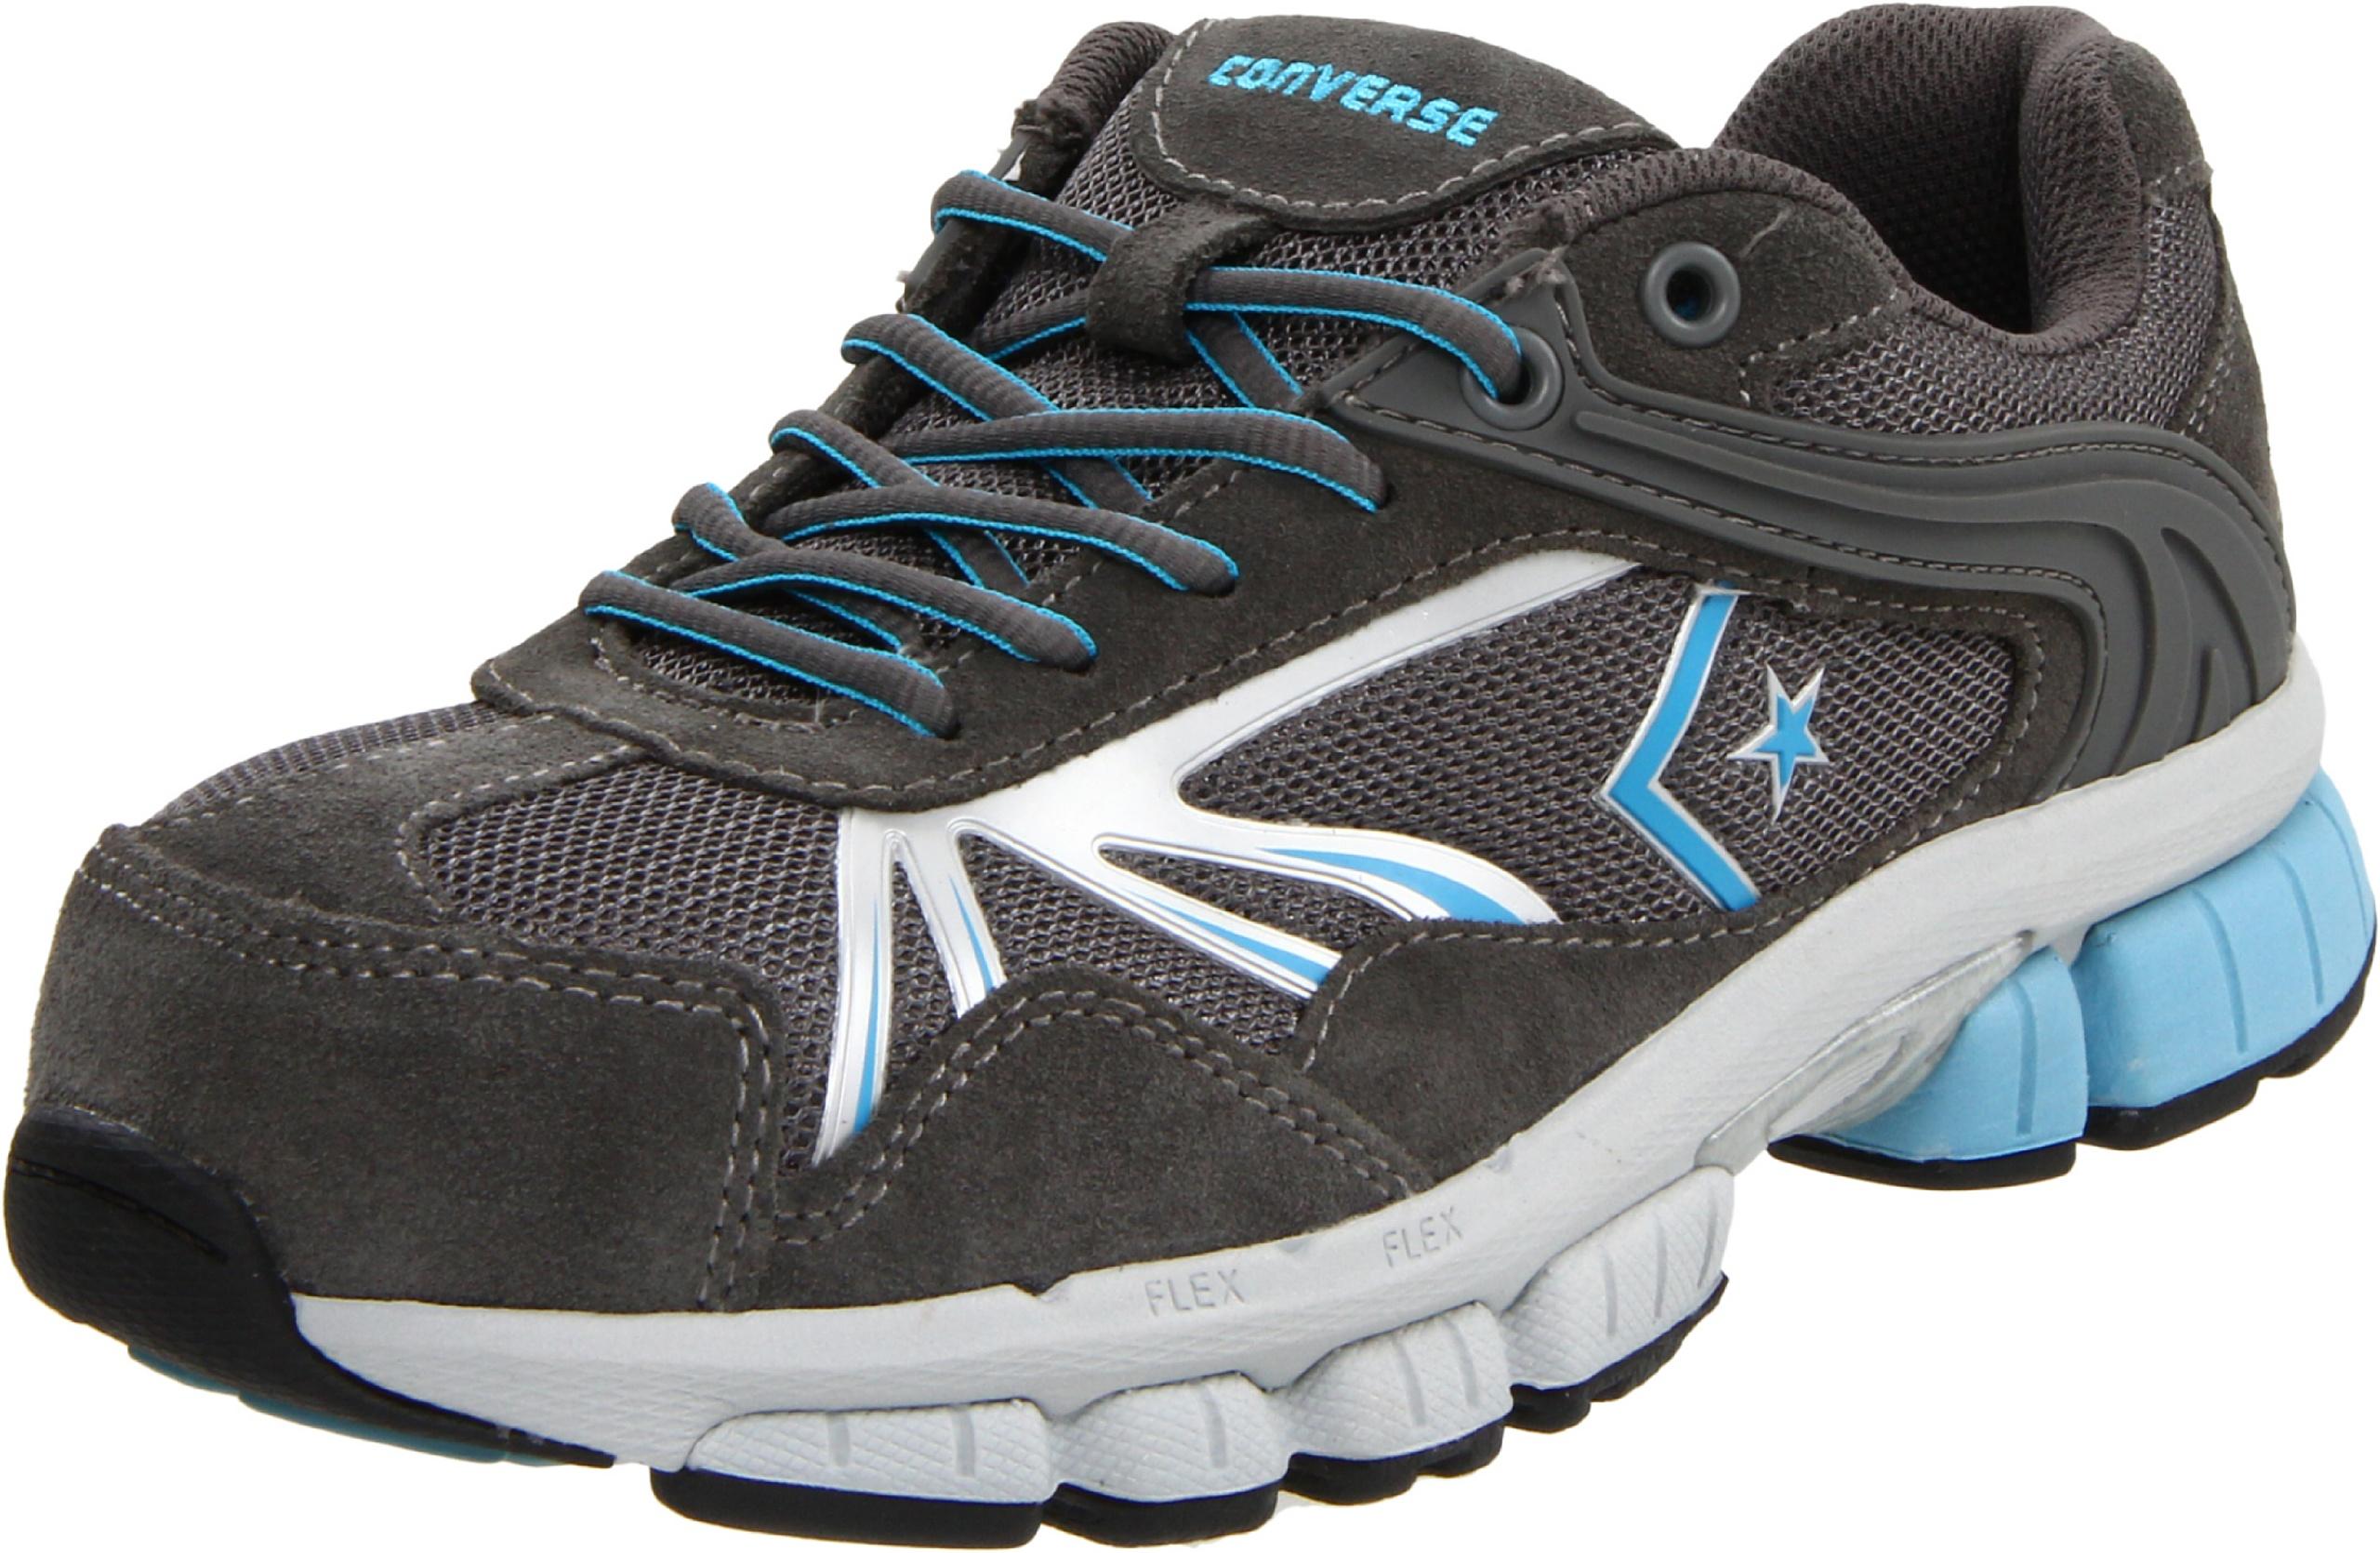 kupować jakość zakupy Details about NEW Converse Work Women's C446 Cross-Training Shoe,Dark  Grey/Blue,7.5 Wide US